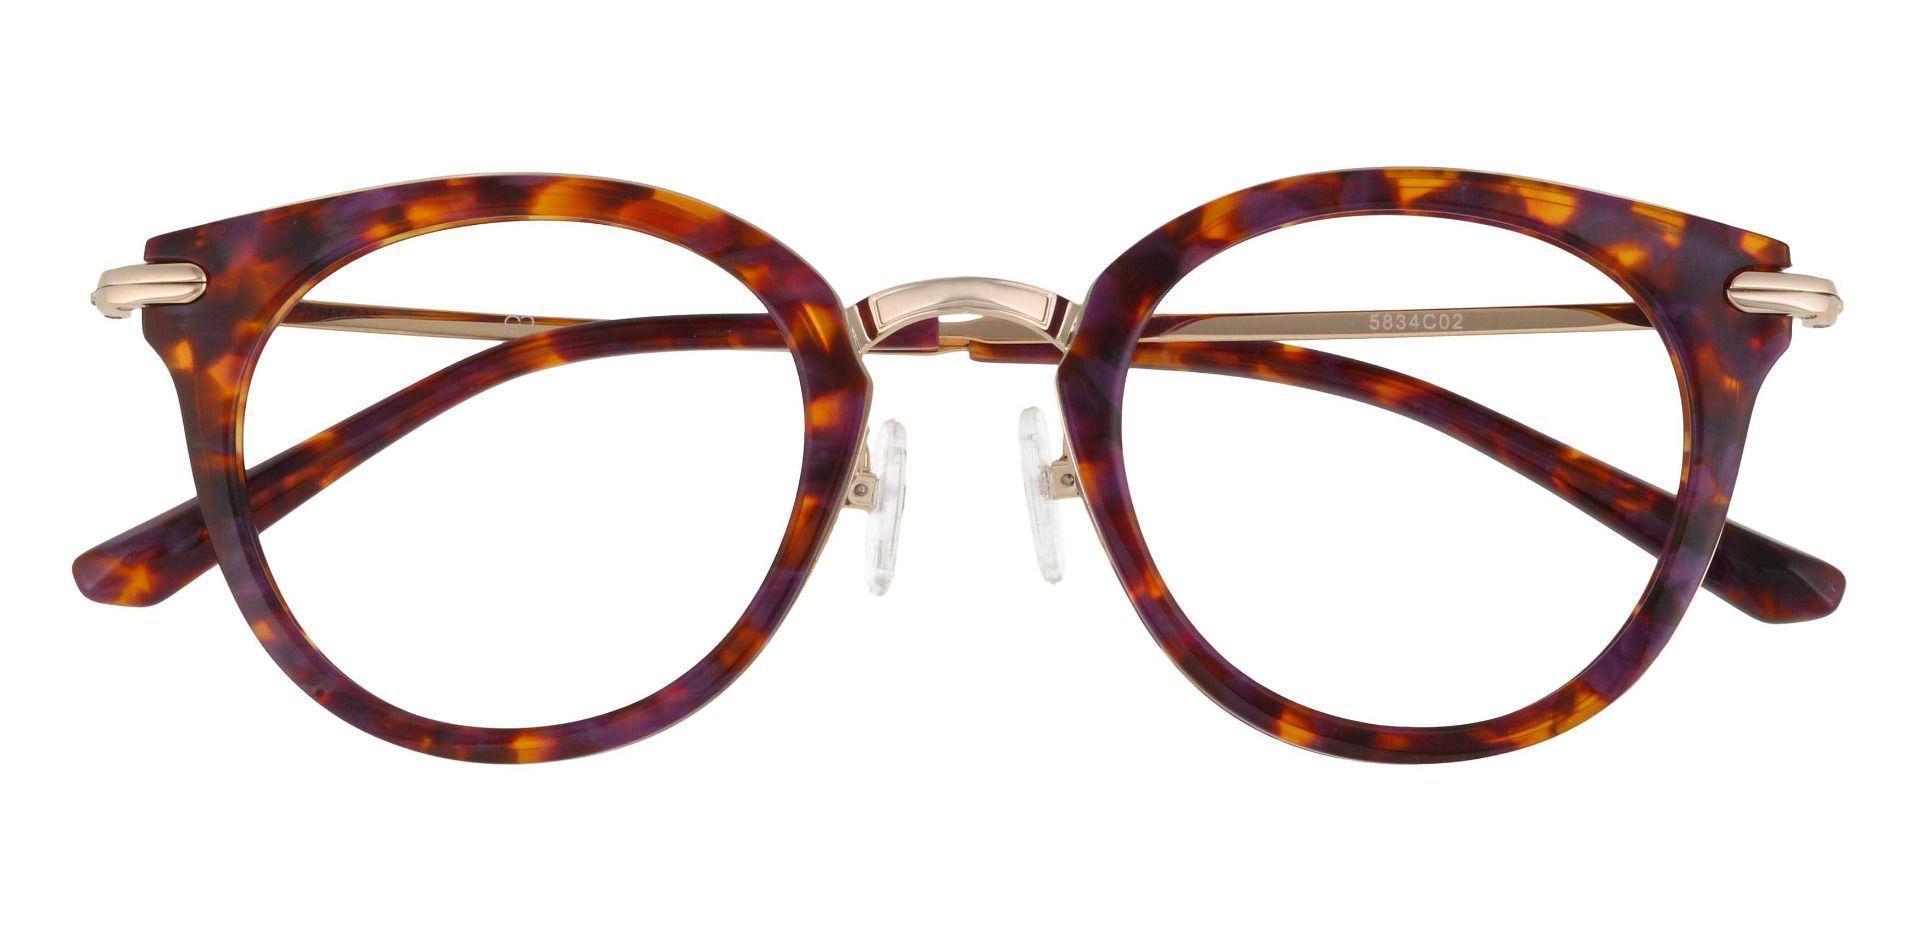 Seneca Round Prescription Glasses - Floral